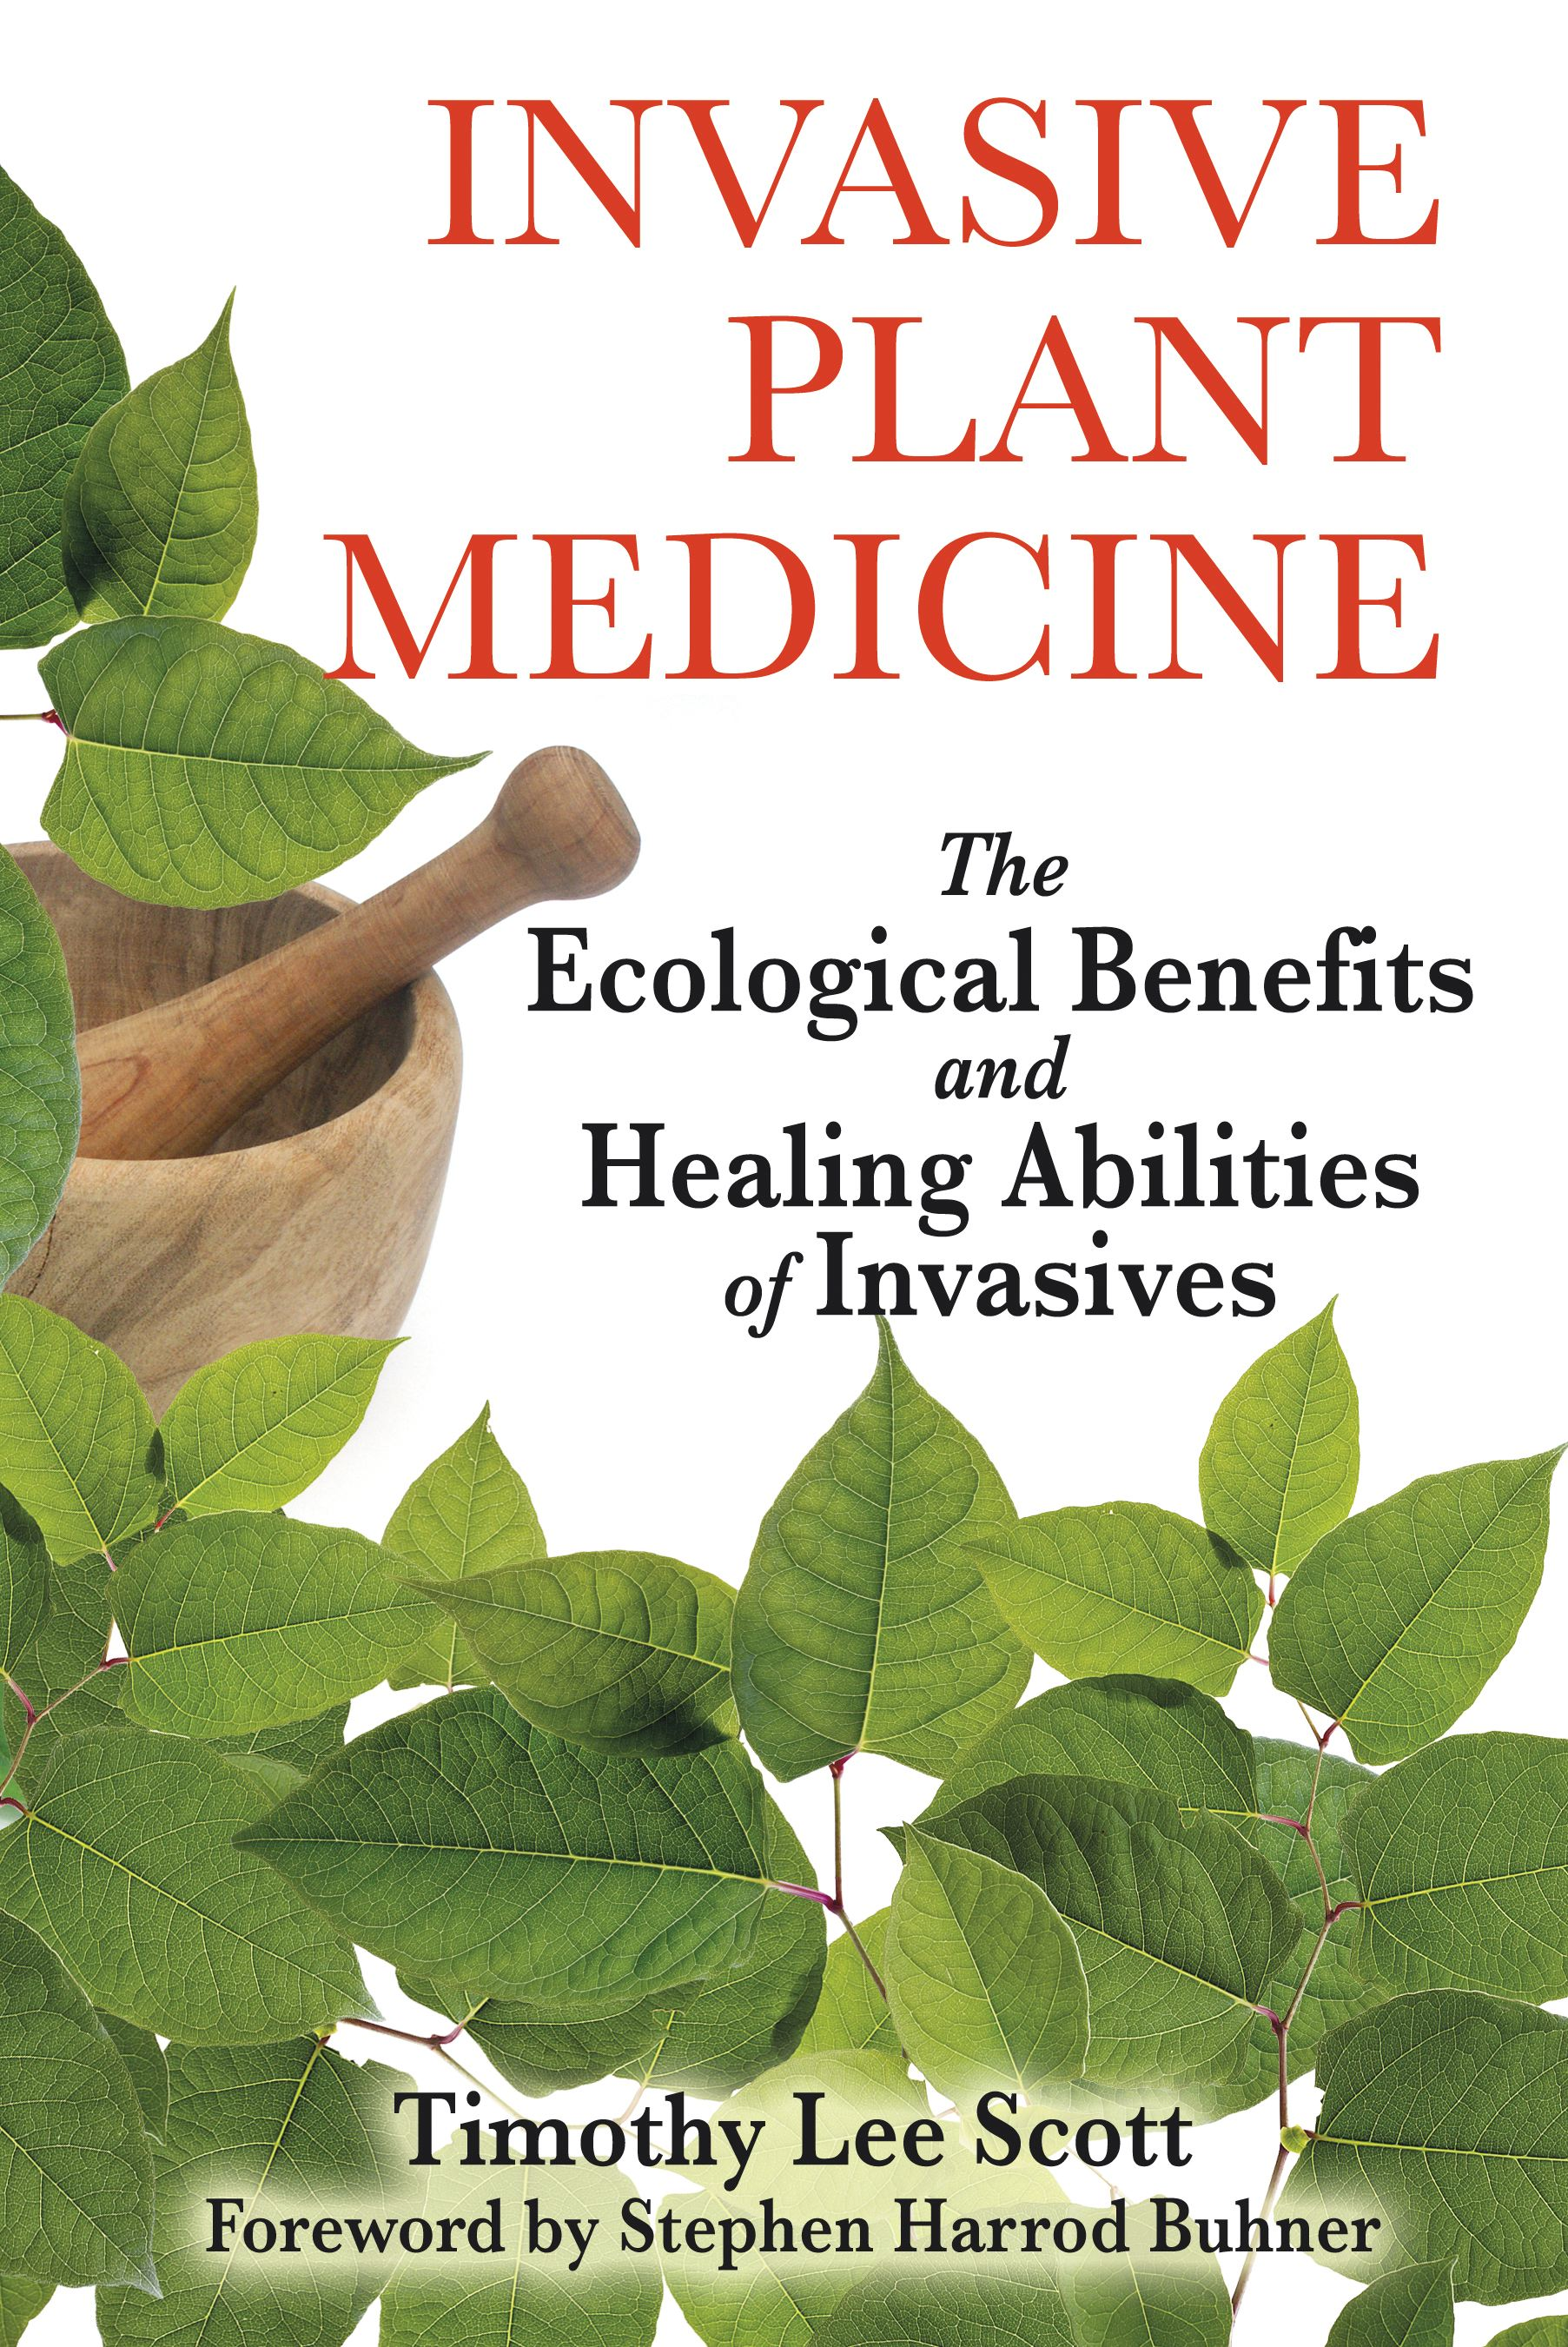 Invasive plant medicine 9781594773051 hr